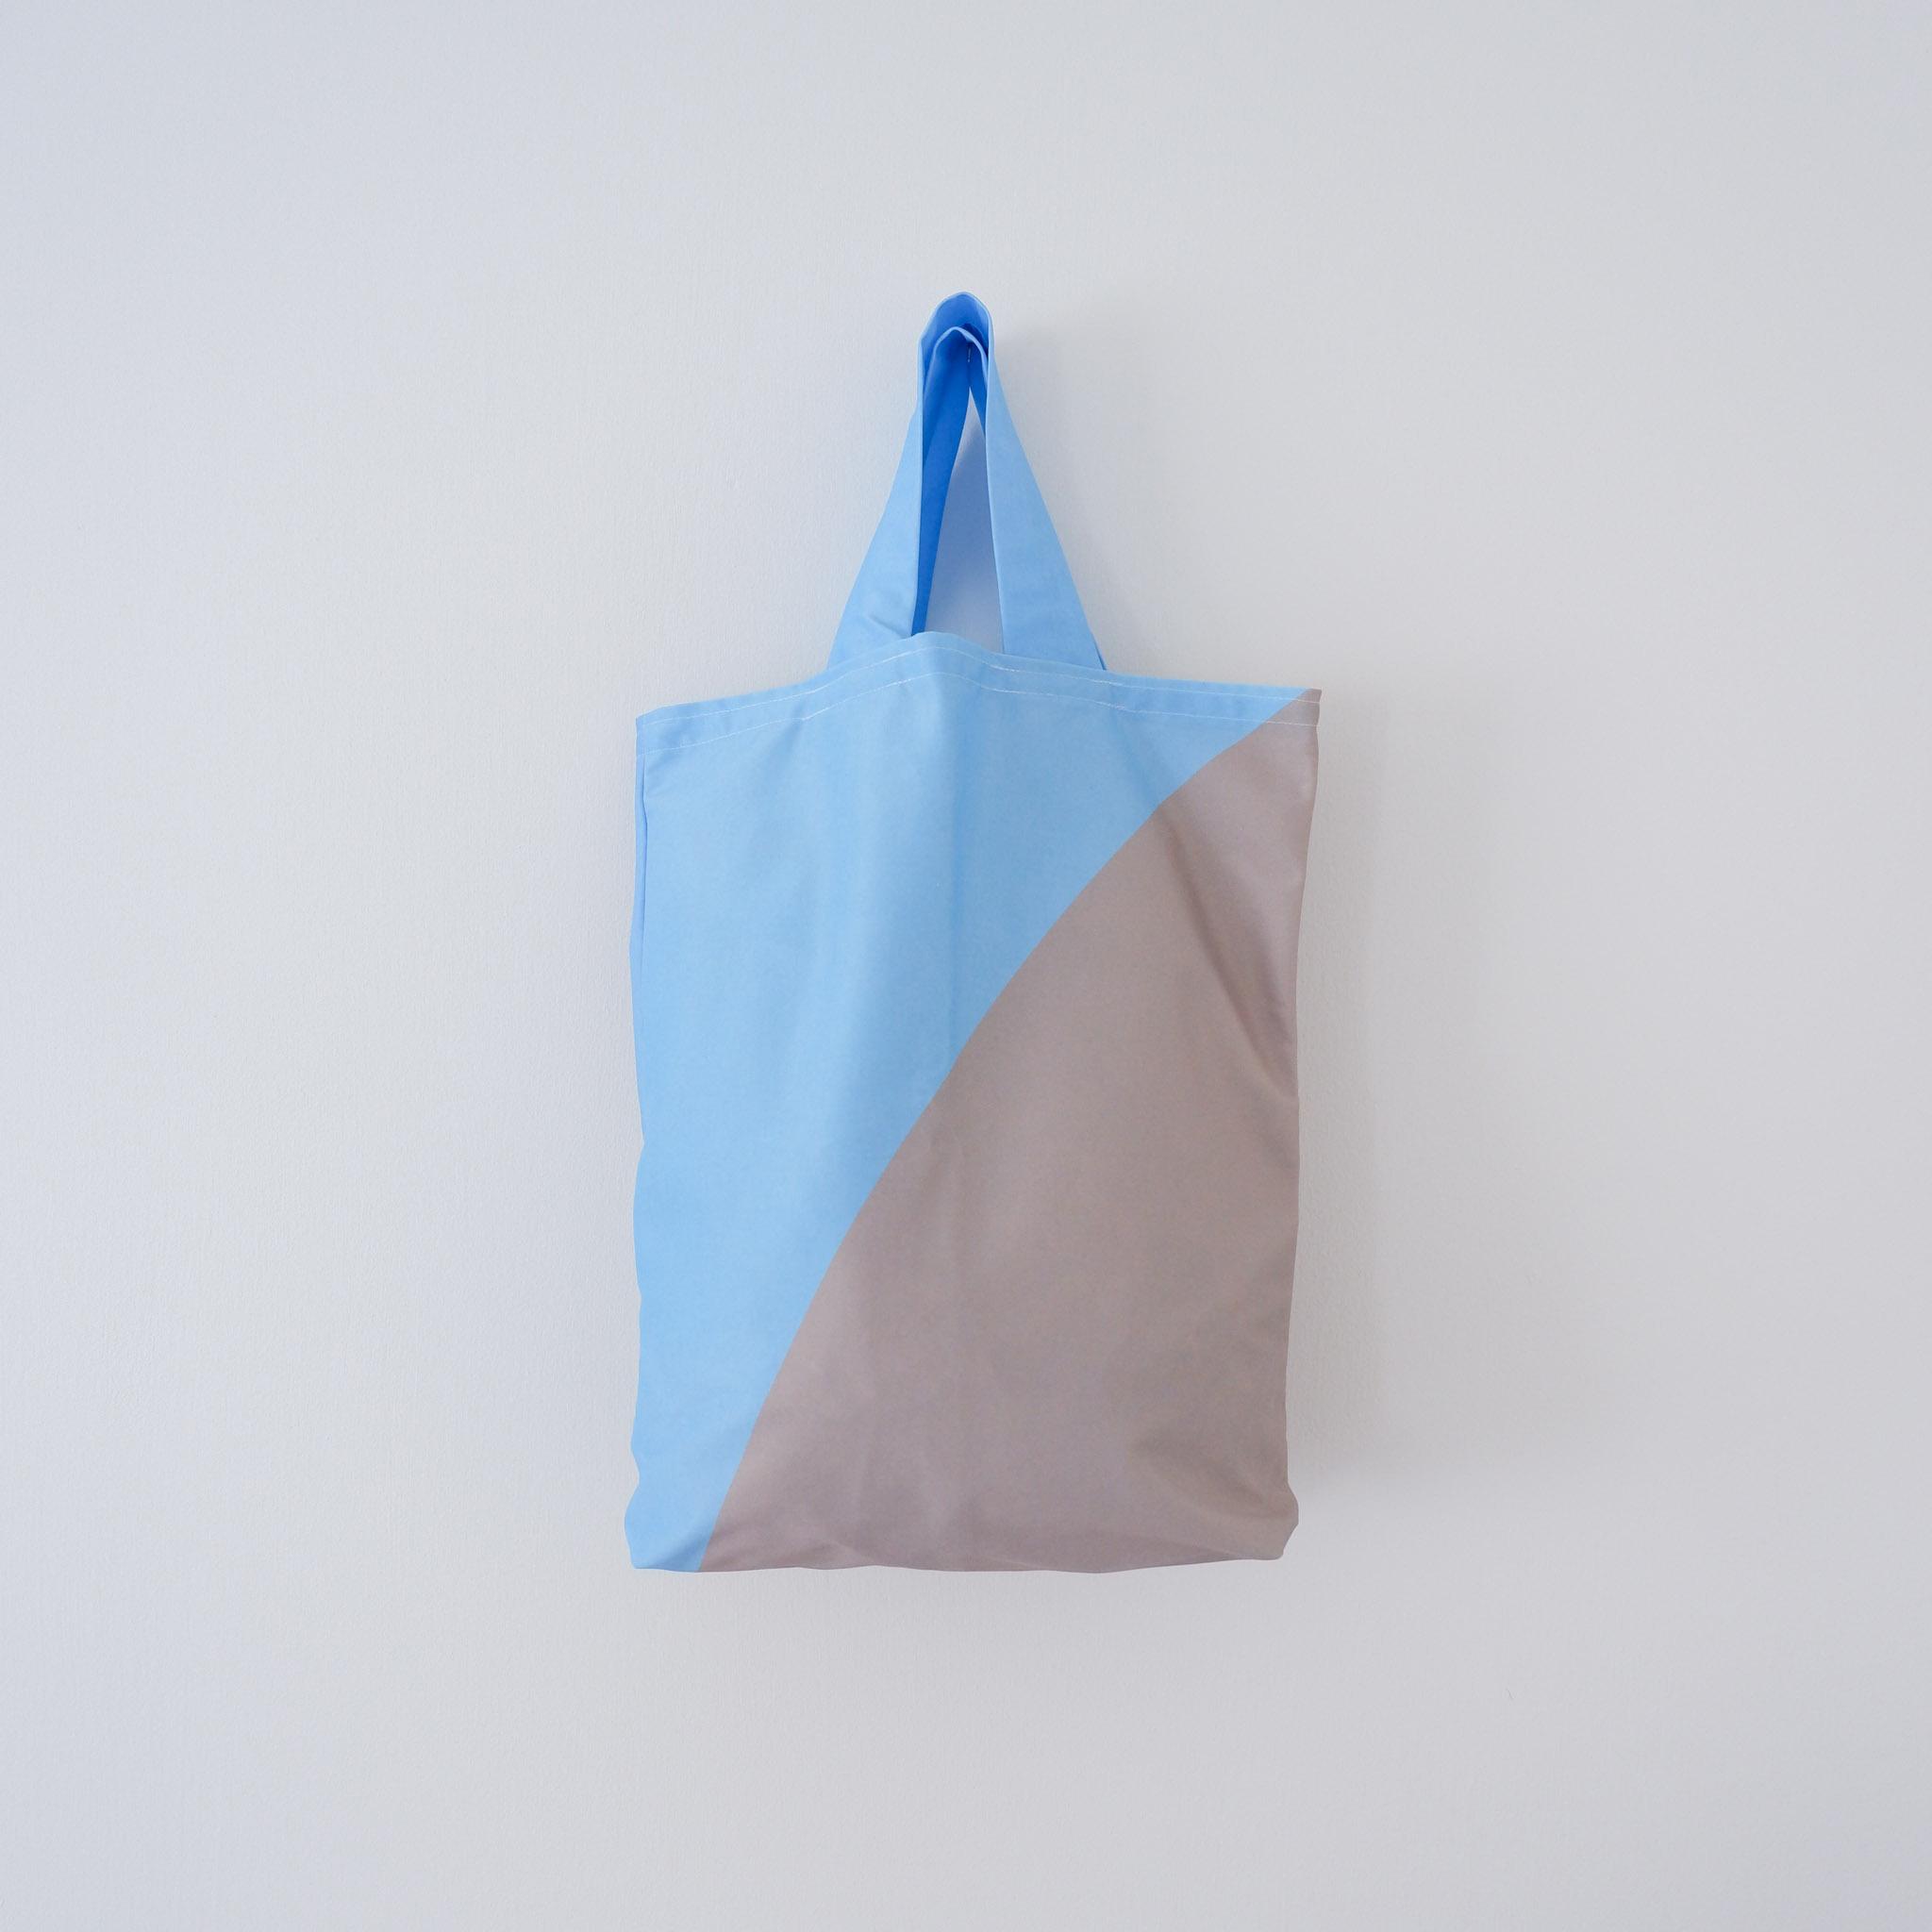 Tote Bag… Blue & Beige